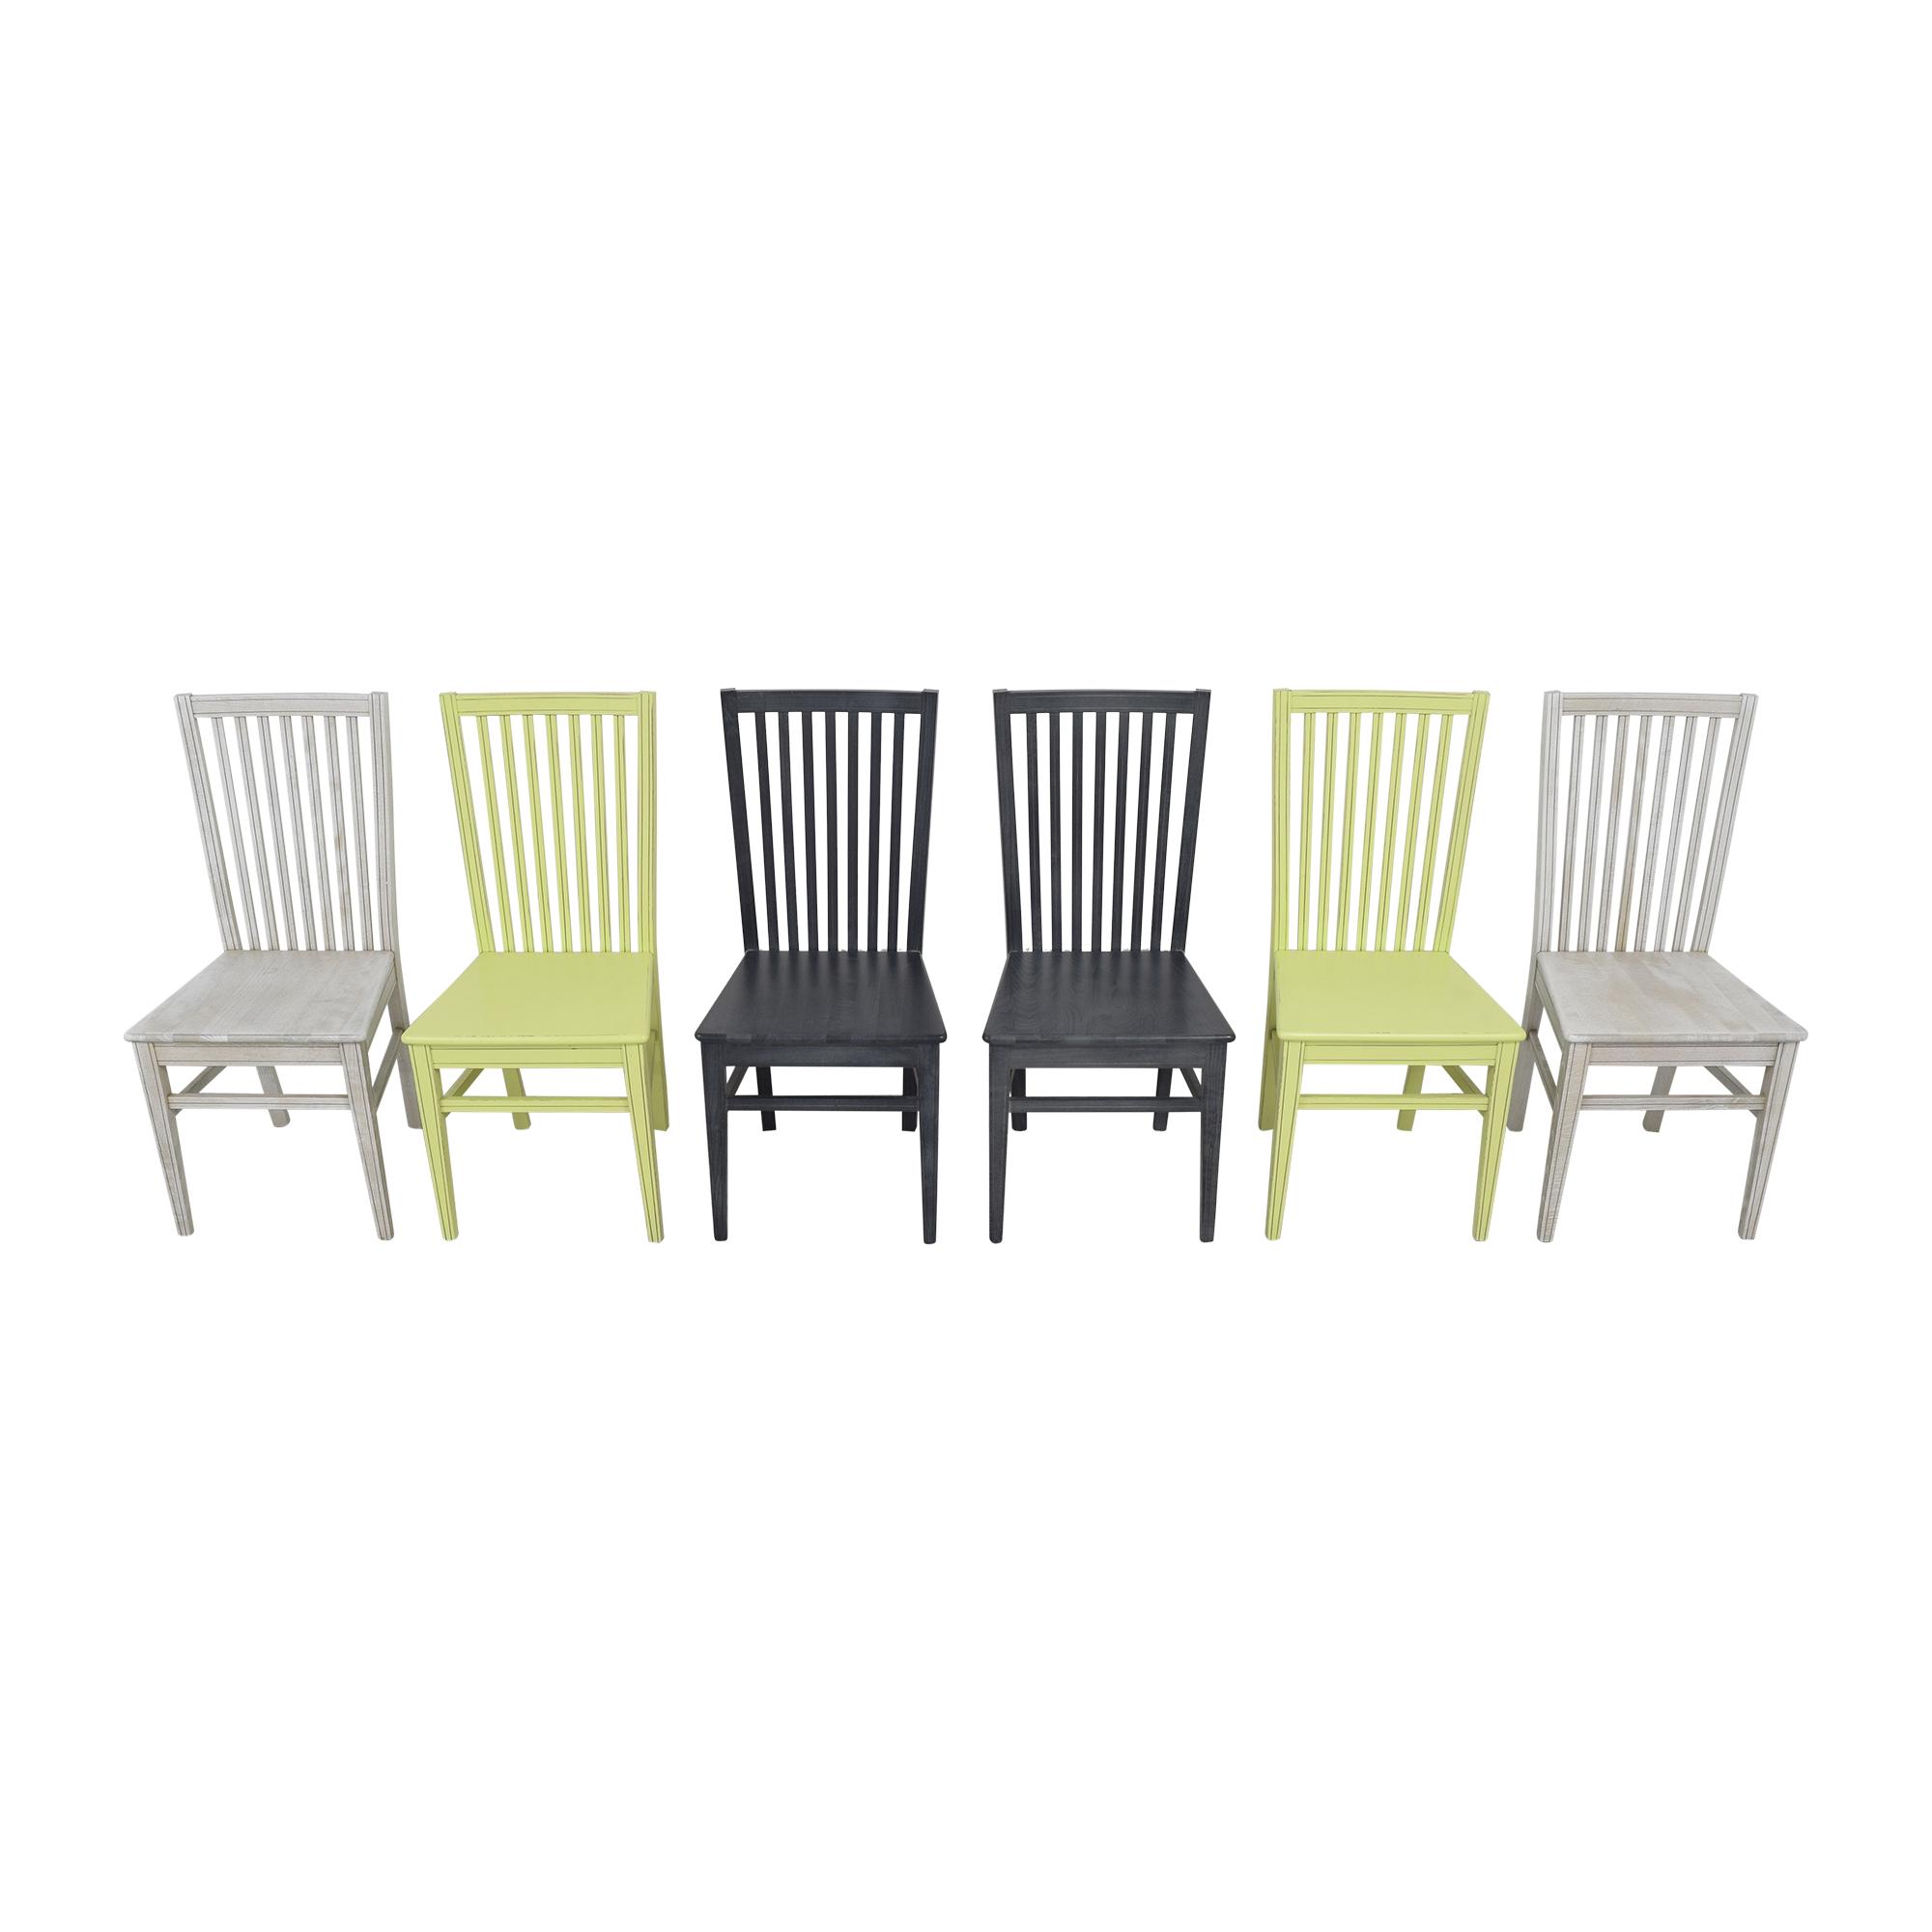 55 Off Arhaus Arhaus Farmhouse Style Dining Chairs Chairs